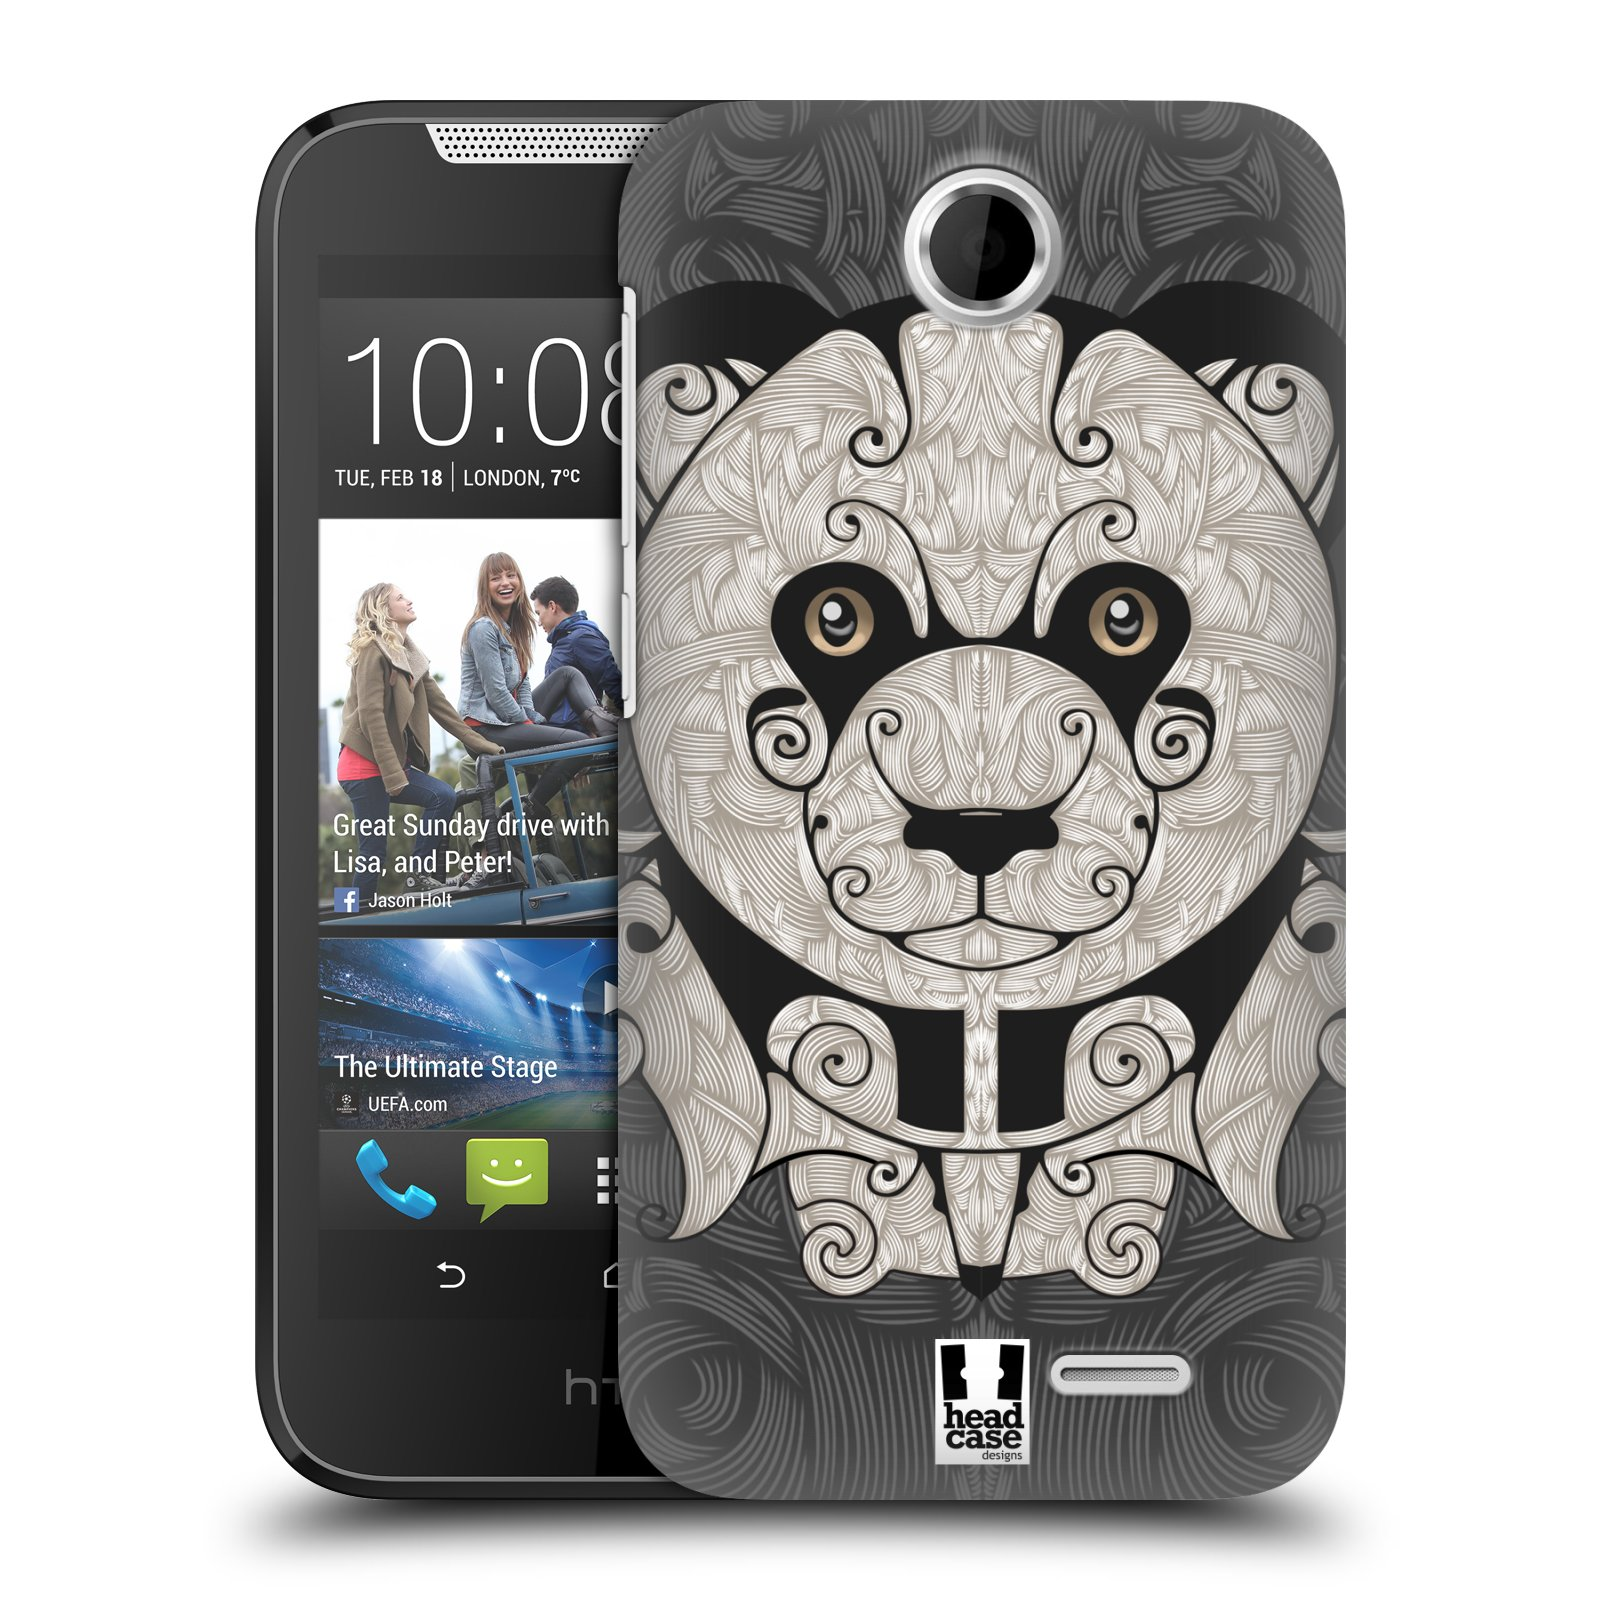 HEAD CASE plastový obal na mobil HTC Desire 310 vzor kudrlinky zvíře panda